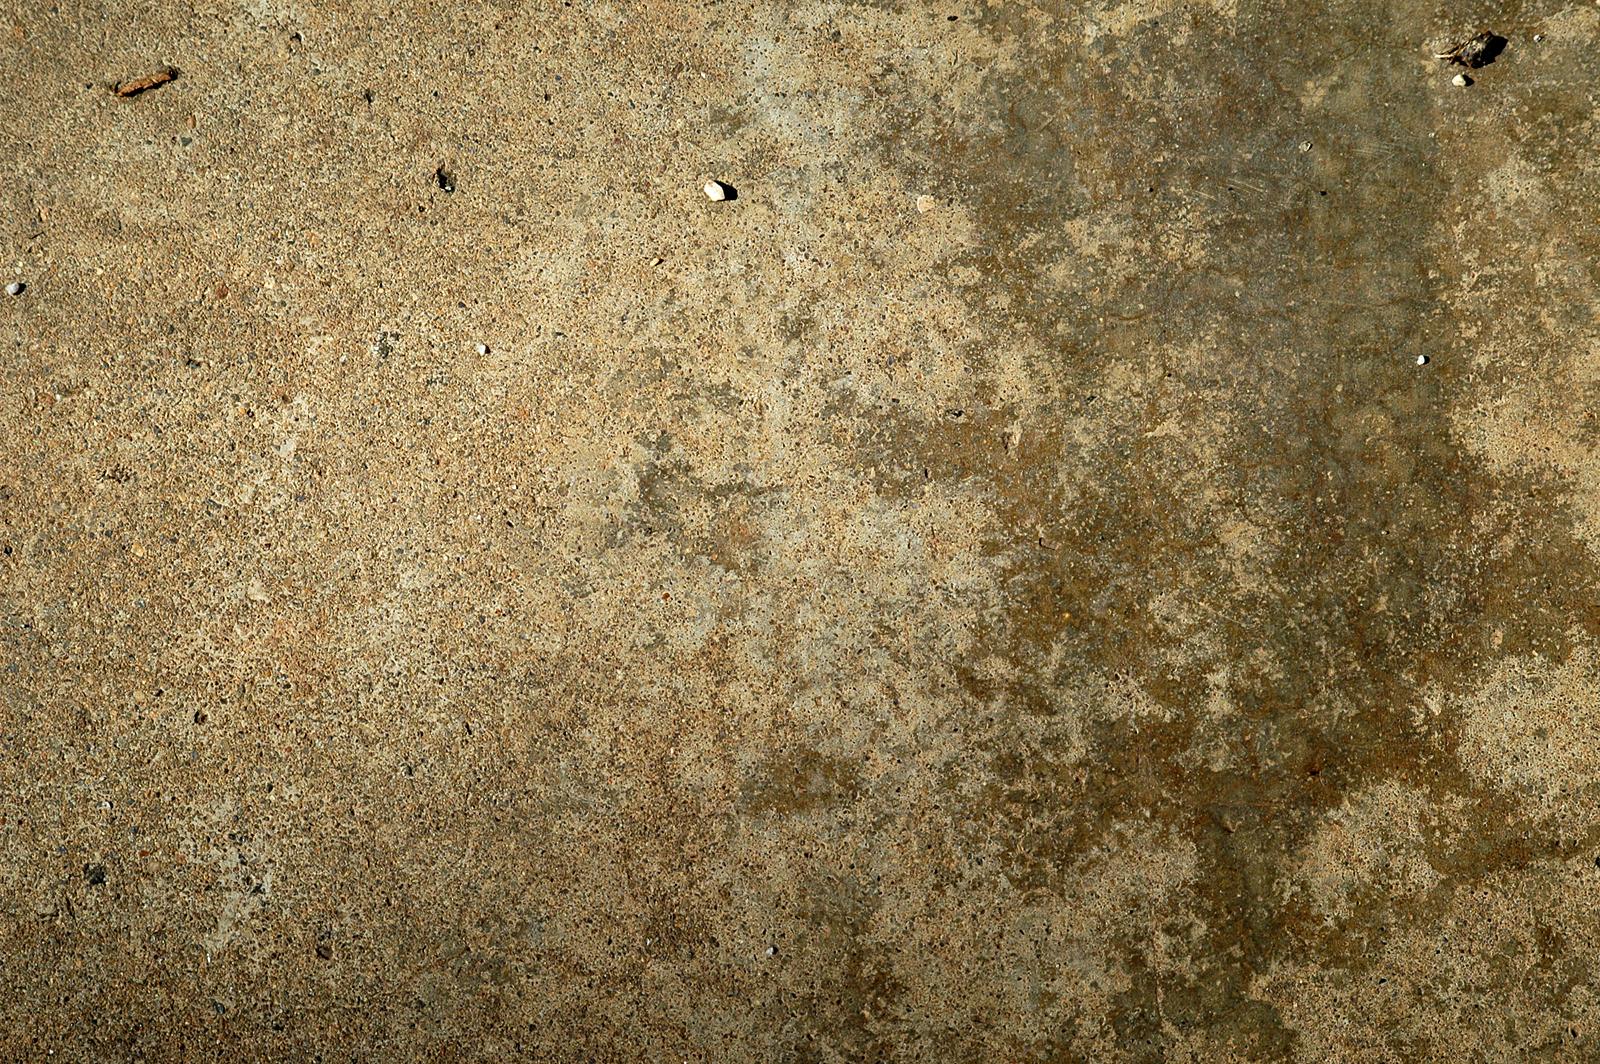 Dirt Texture Southern California Grading